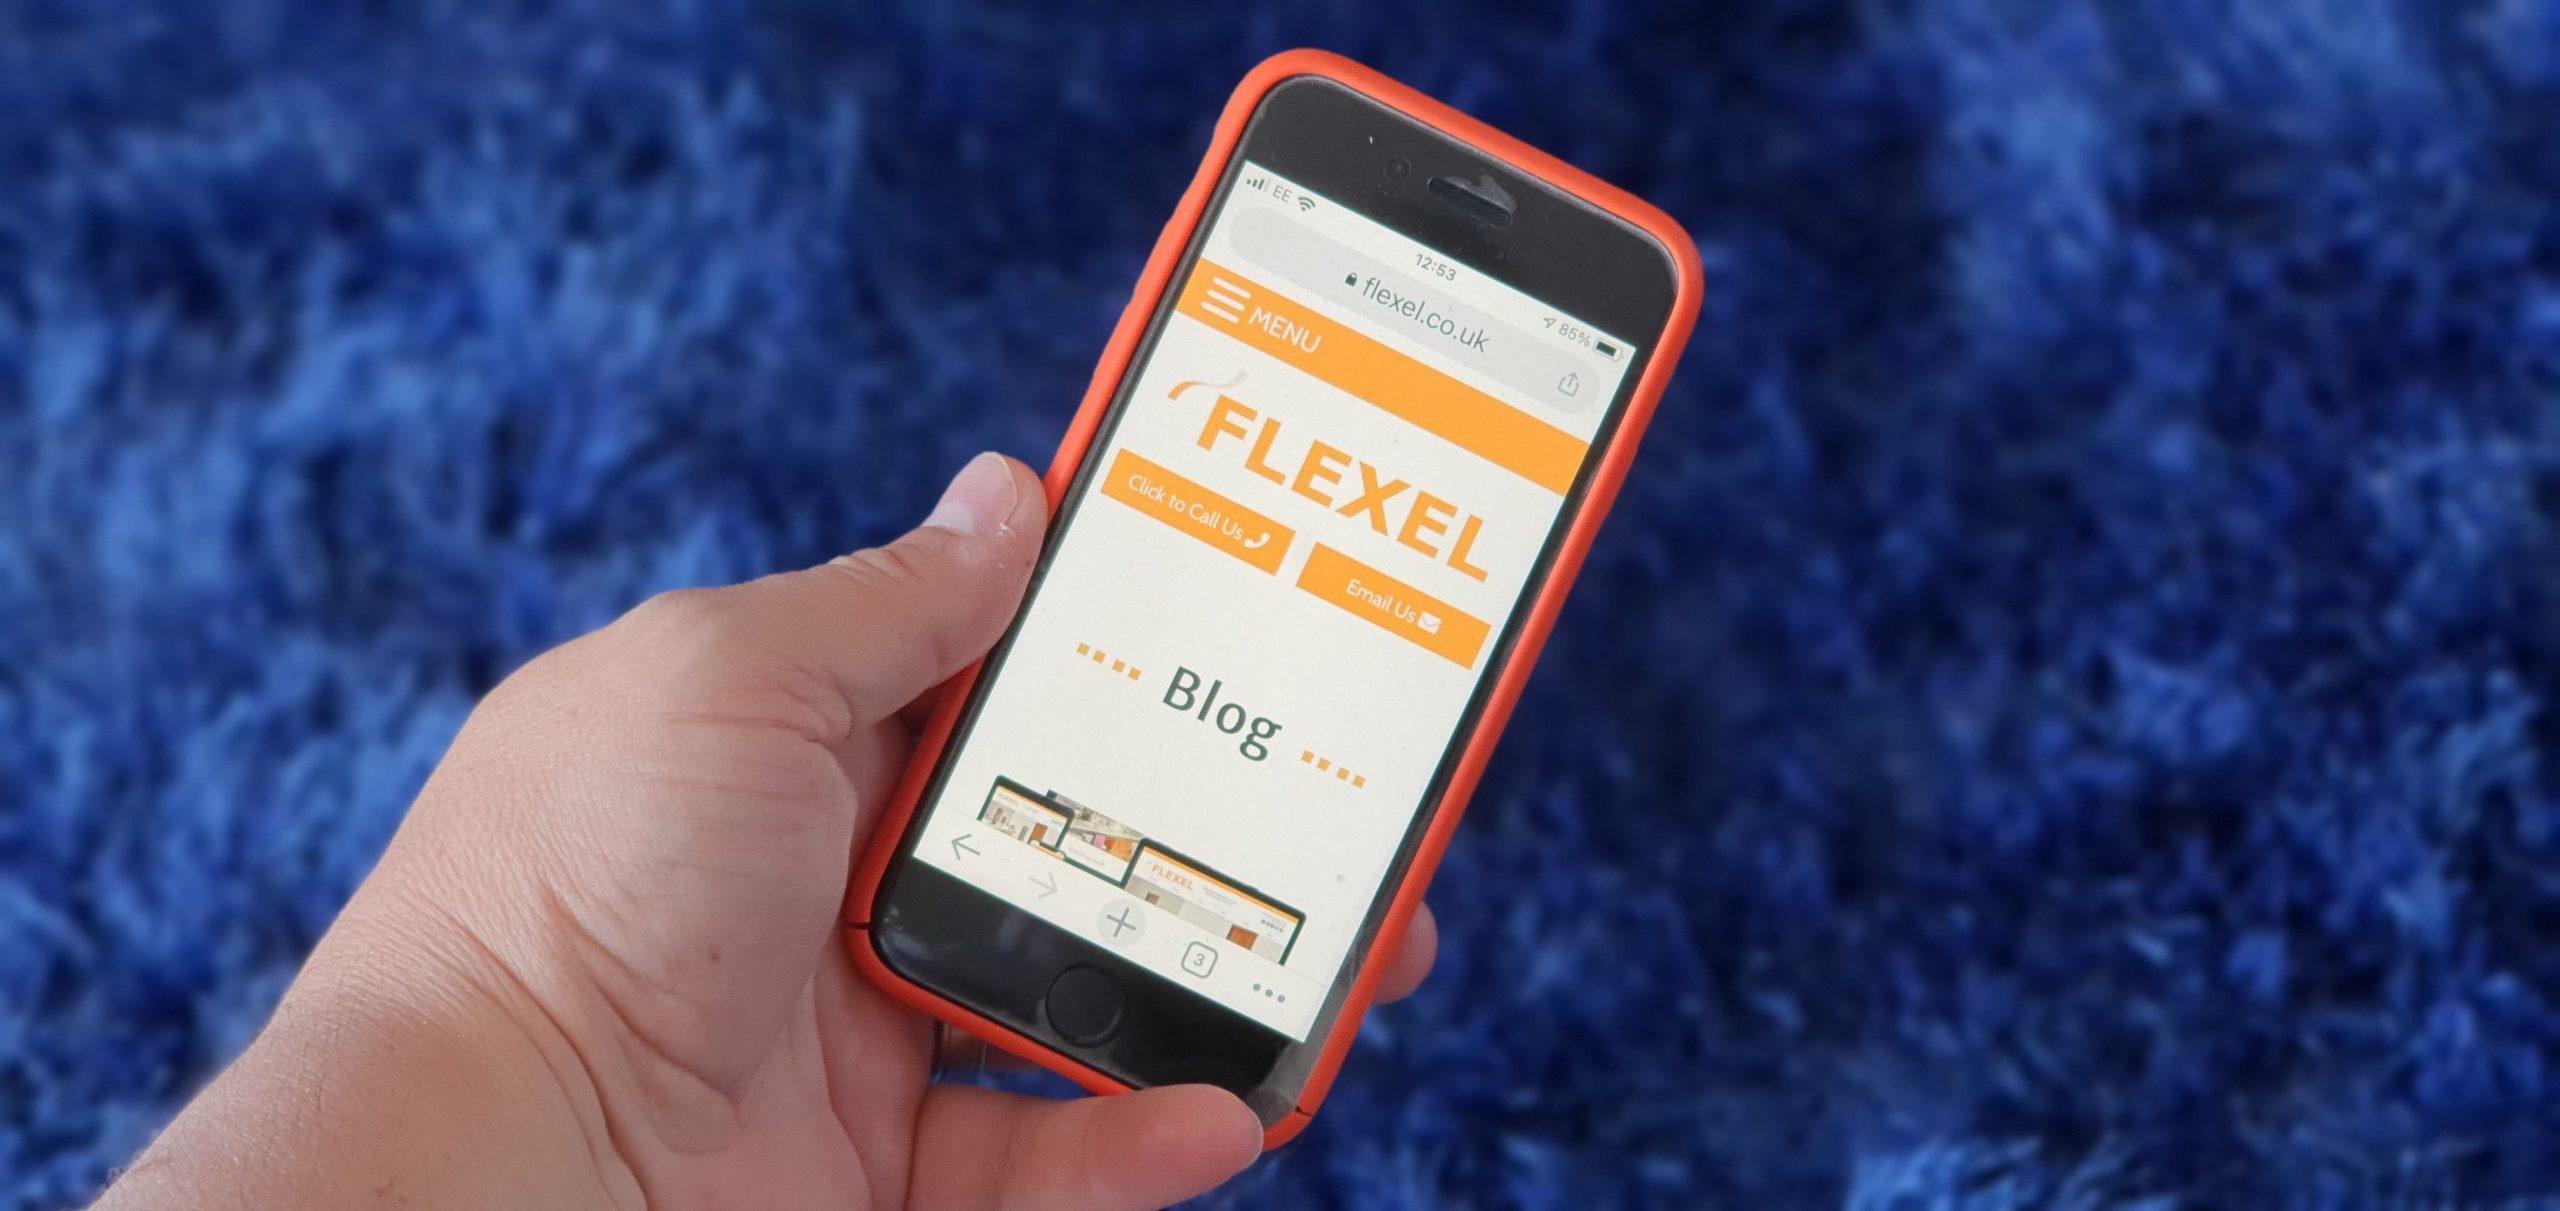 Flexel Blog Page